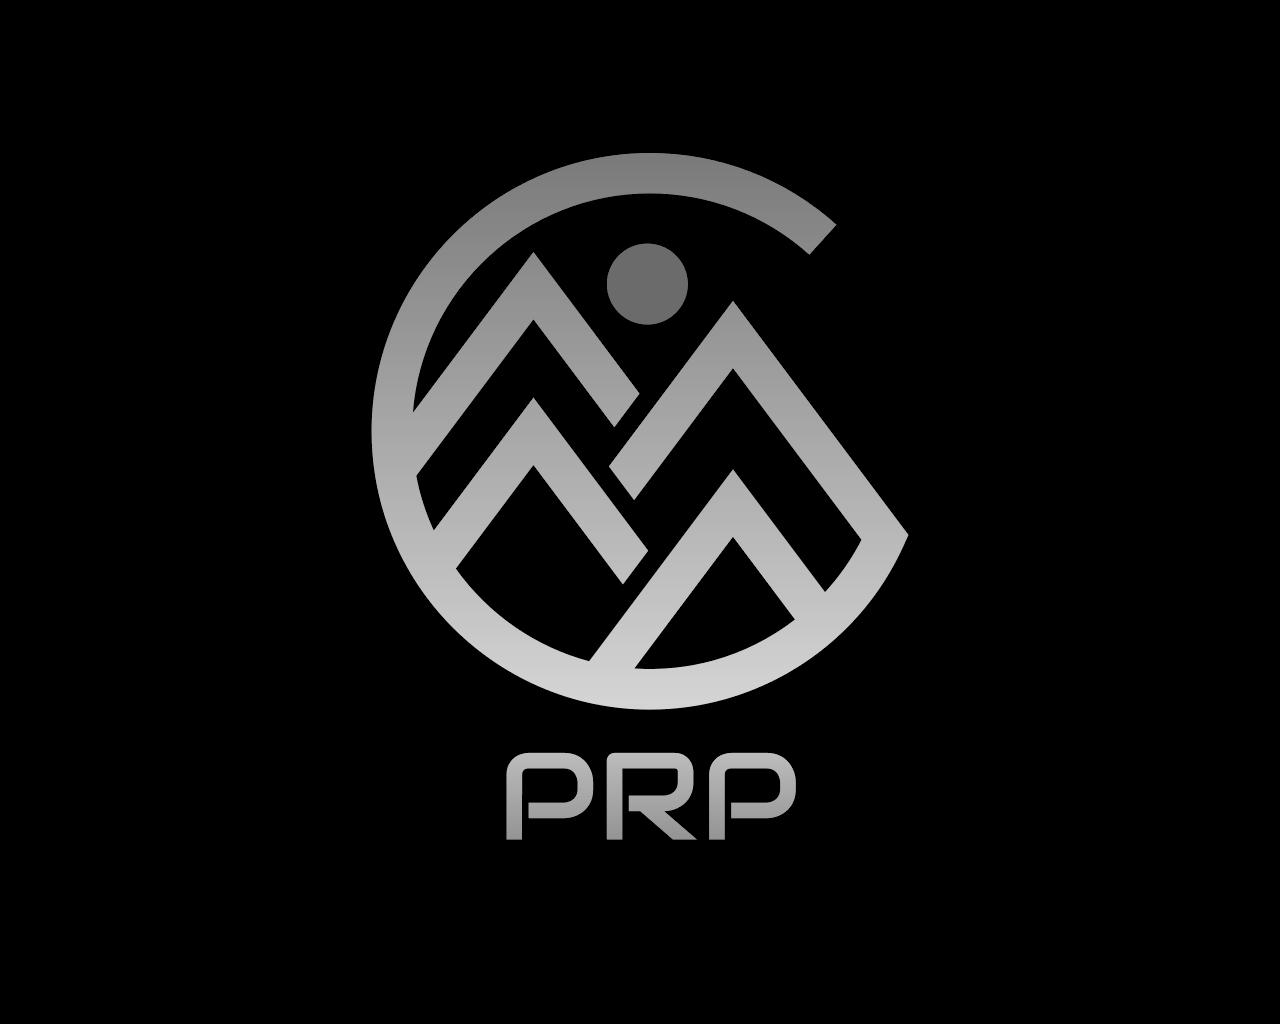 Logo PRP greyscale